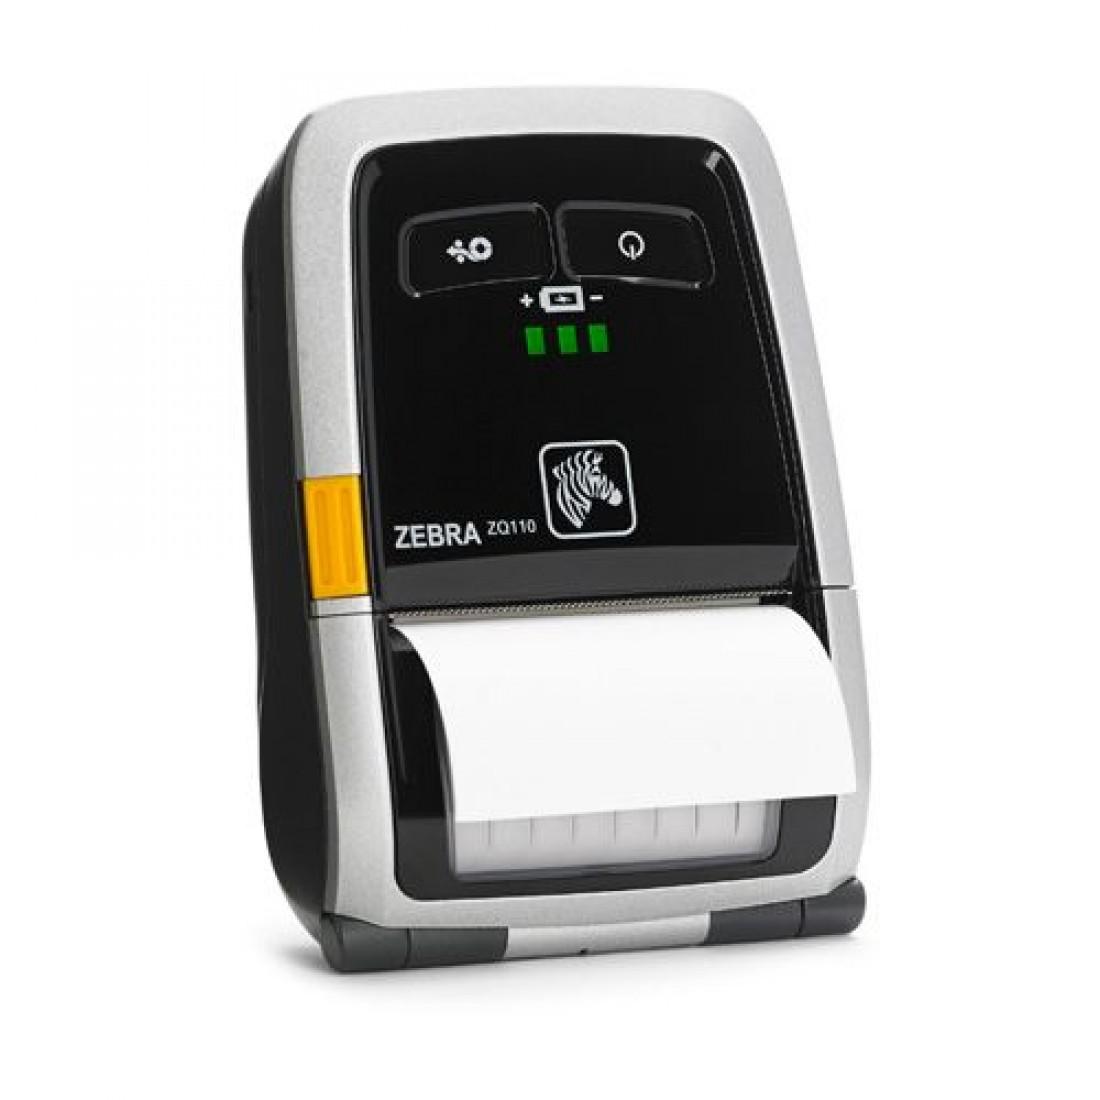 ZQ110 Printer, USB, Bluetooth, MSR, EU Plug